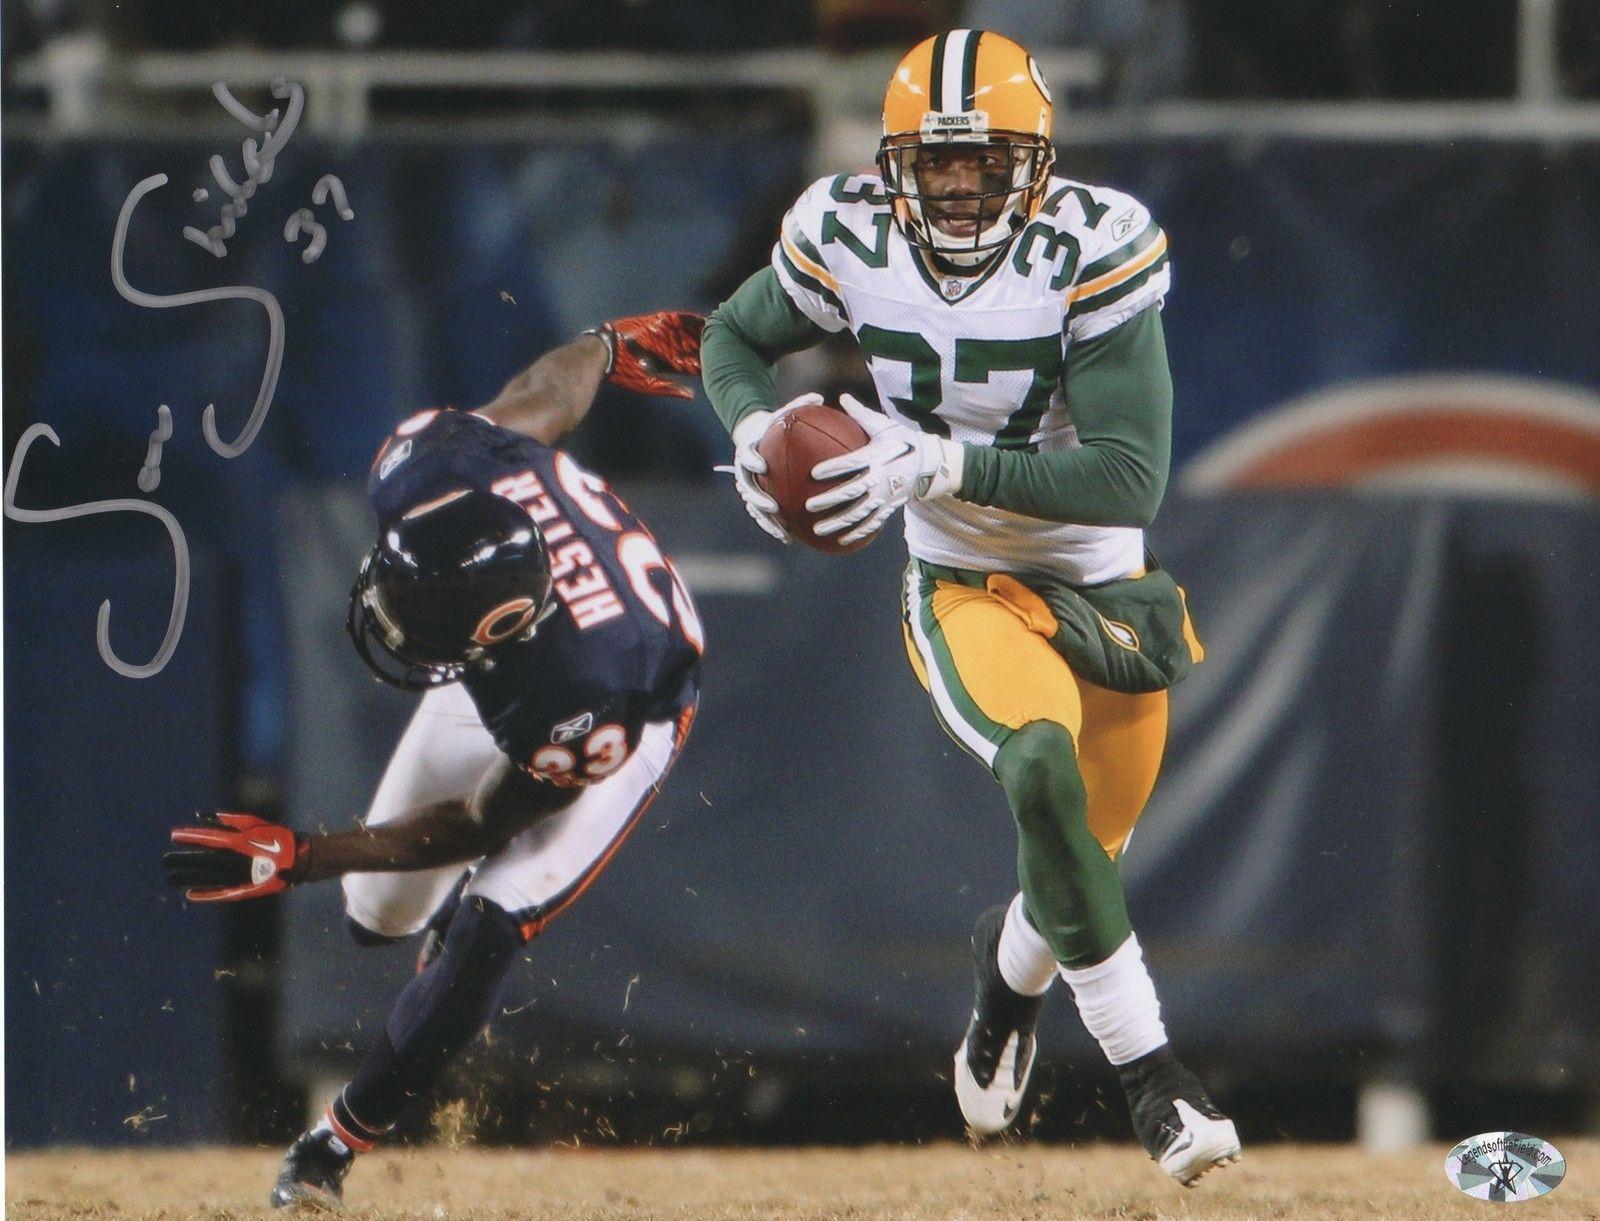 Packers Vs Bears Week 1 Highlights Nfl Green Bay Packers Vs Chicago Bears Packers Nfl Packers